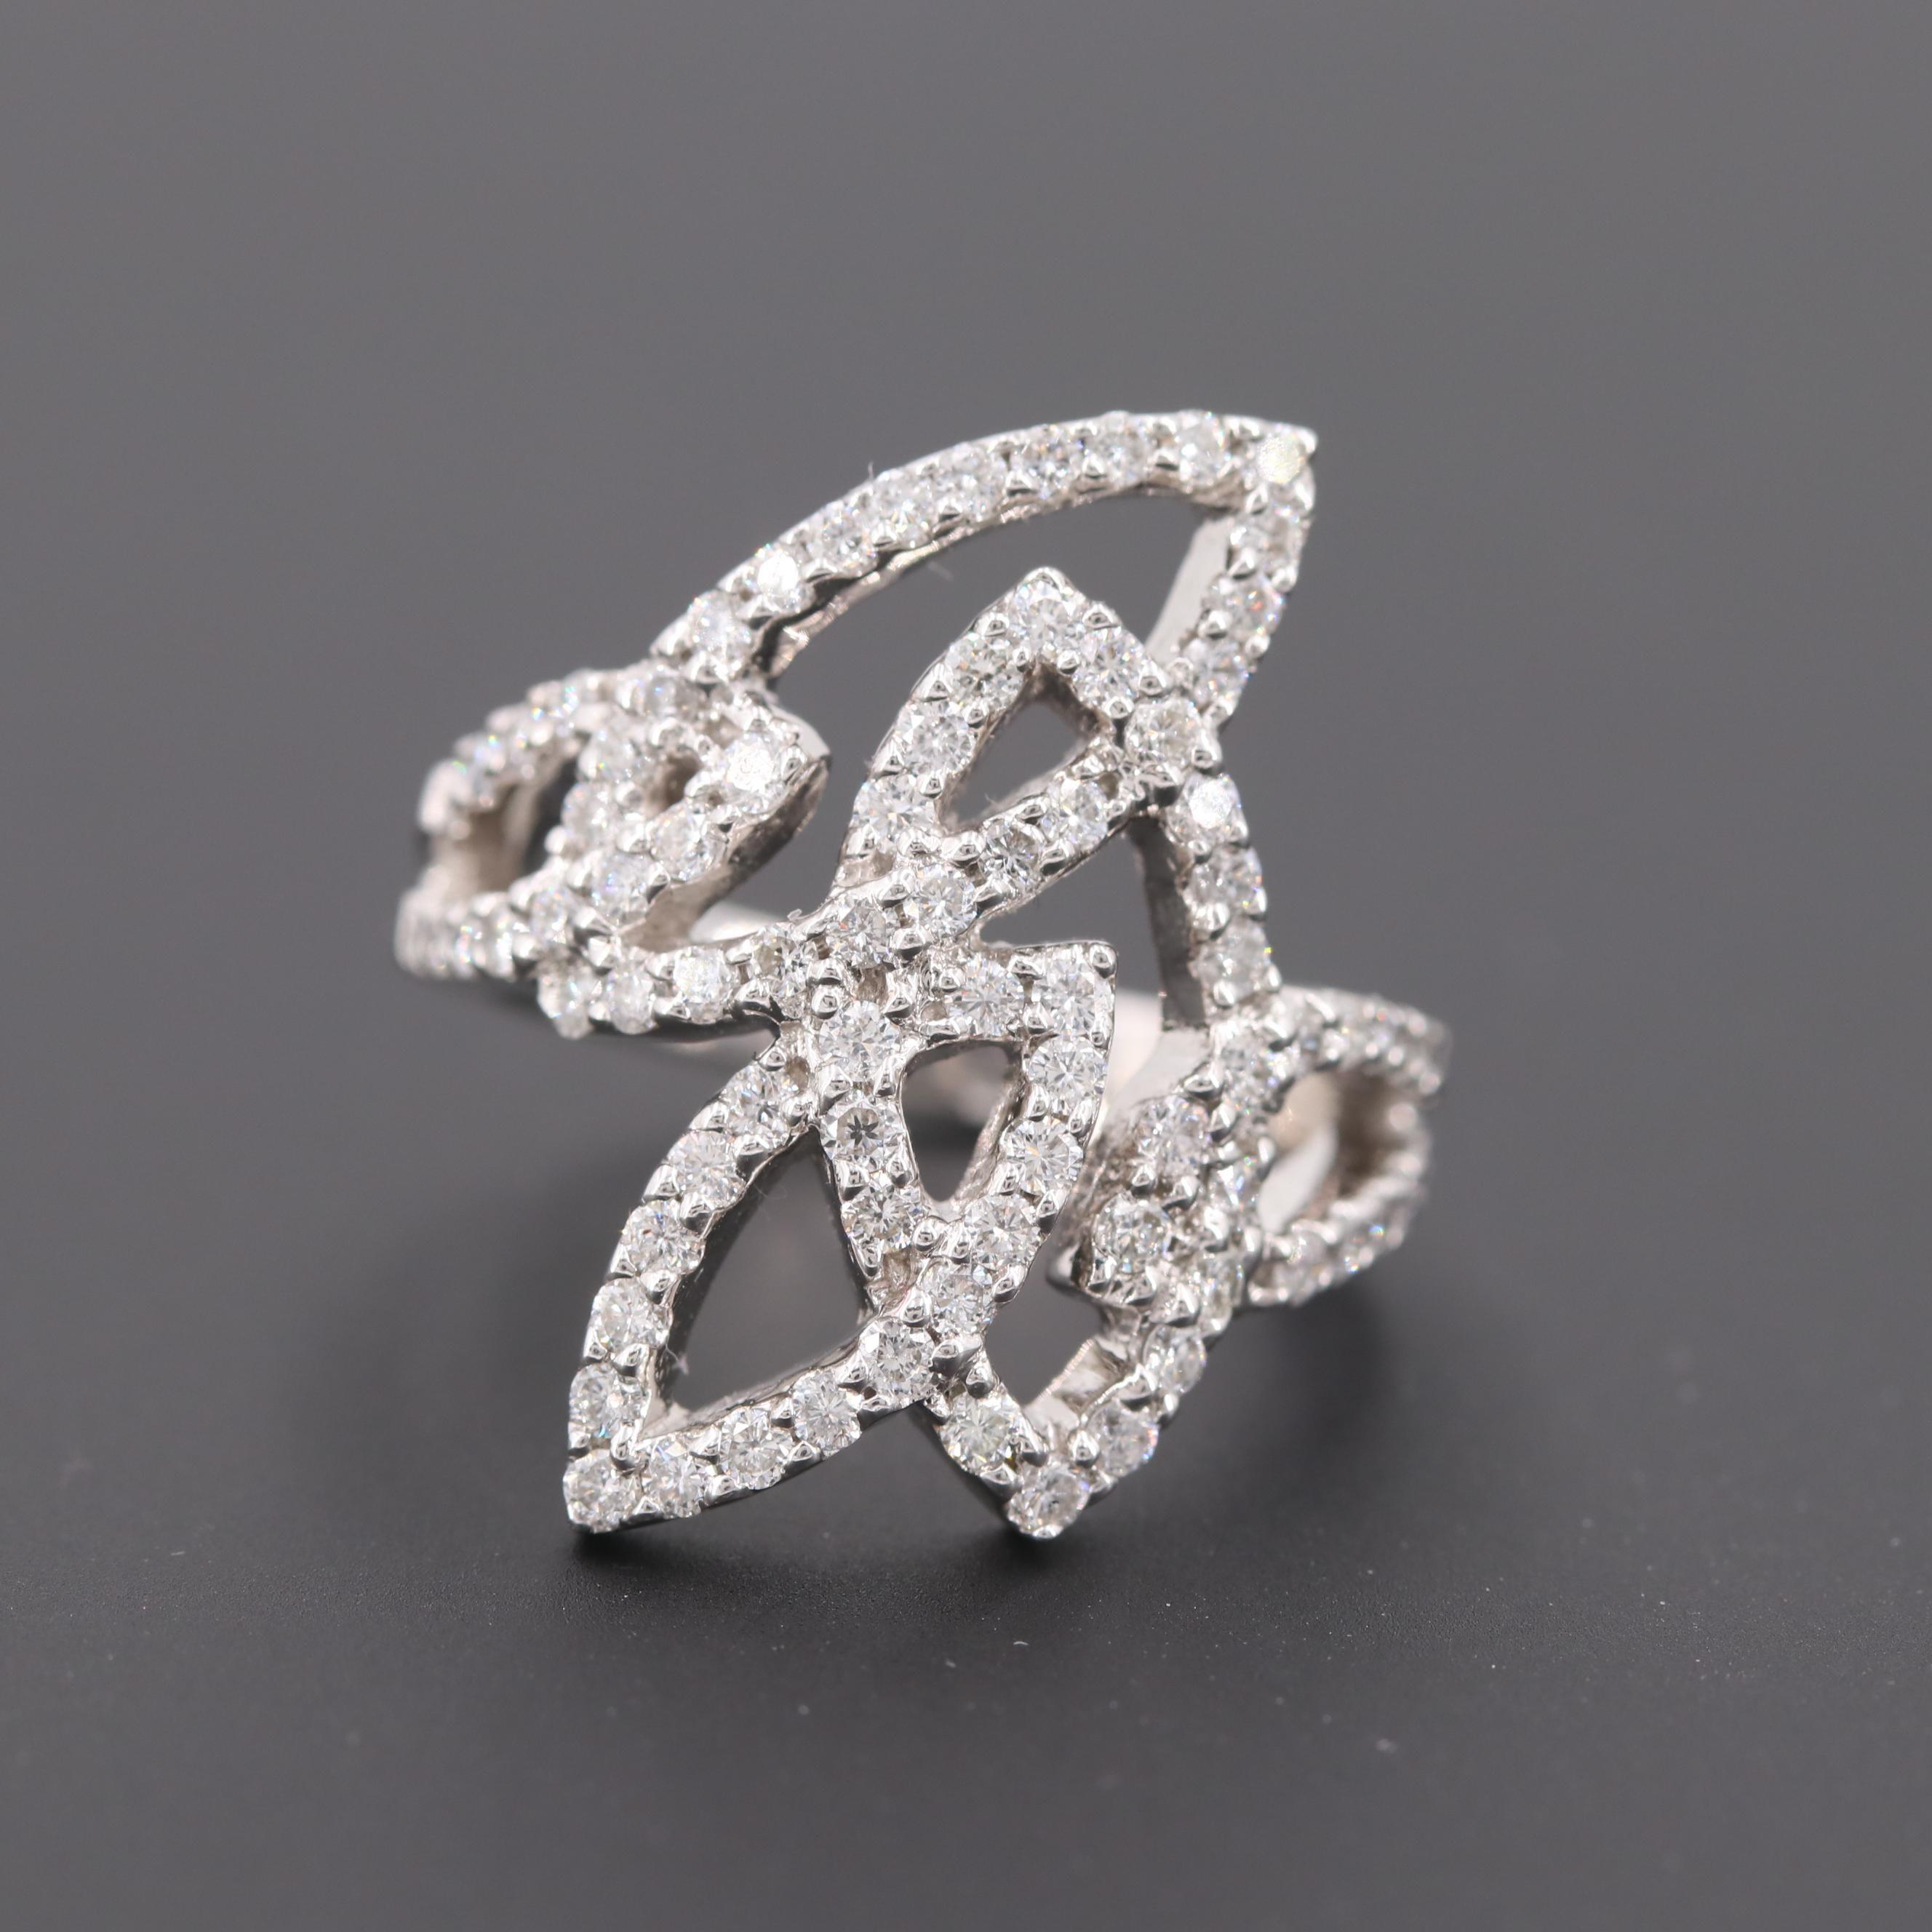 14K White Gold 1.25 CTW Diamond Ring